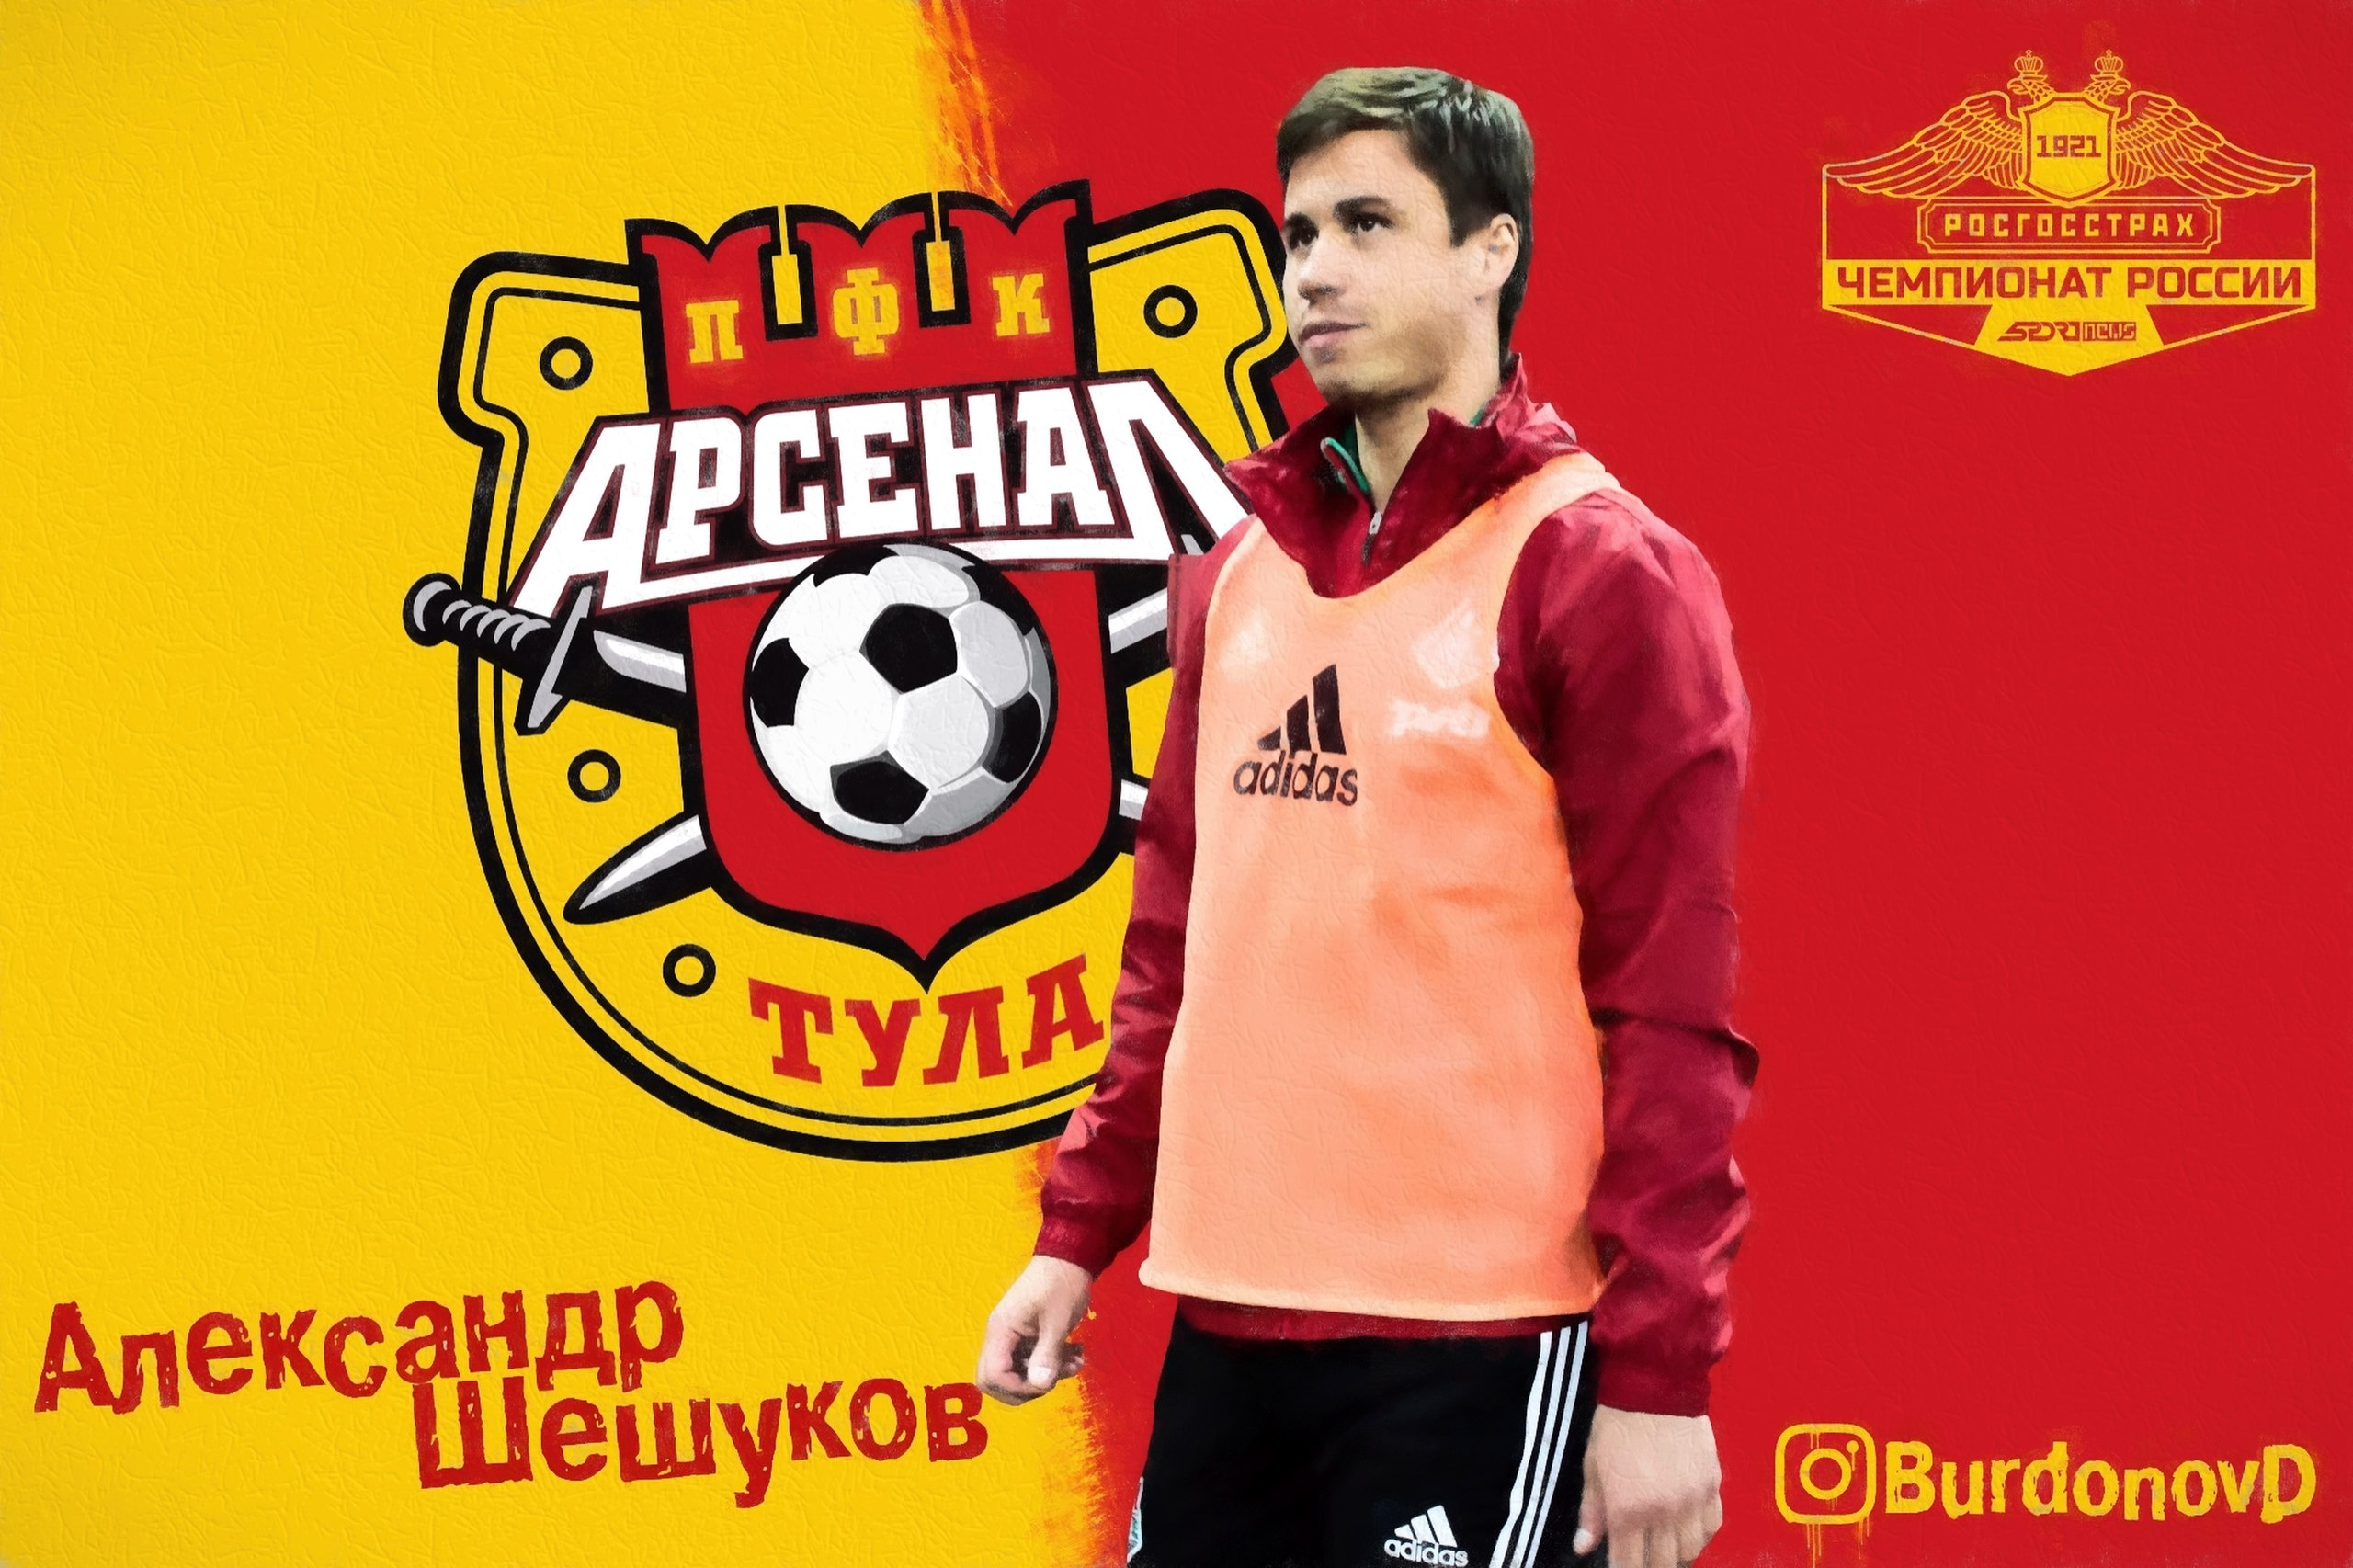 Александр Шешуков (Арсенал Тула). Автор: Дмитрий Бурдонов / Loko.News